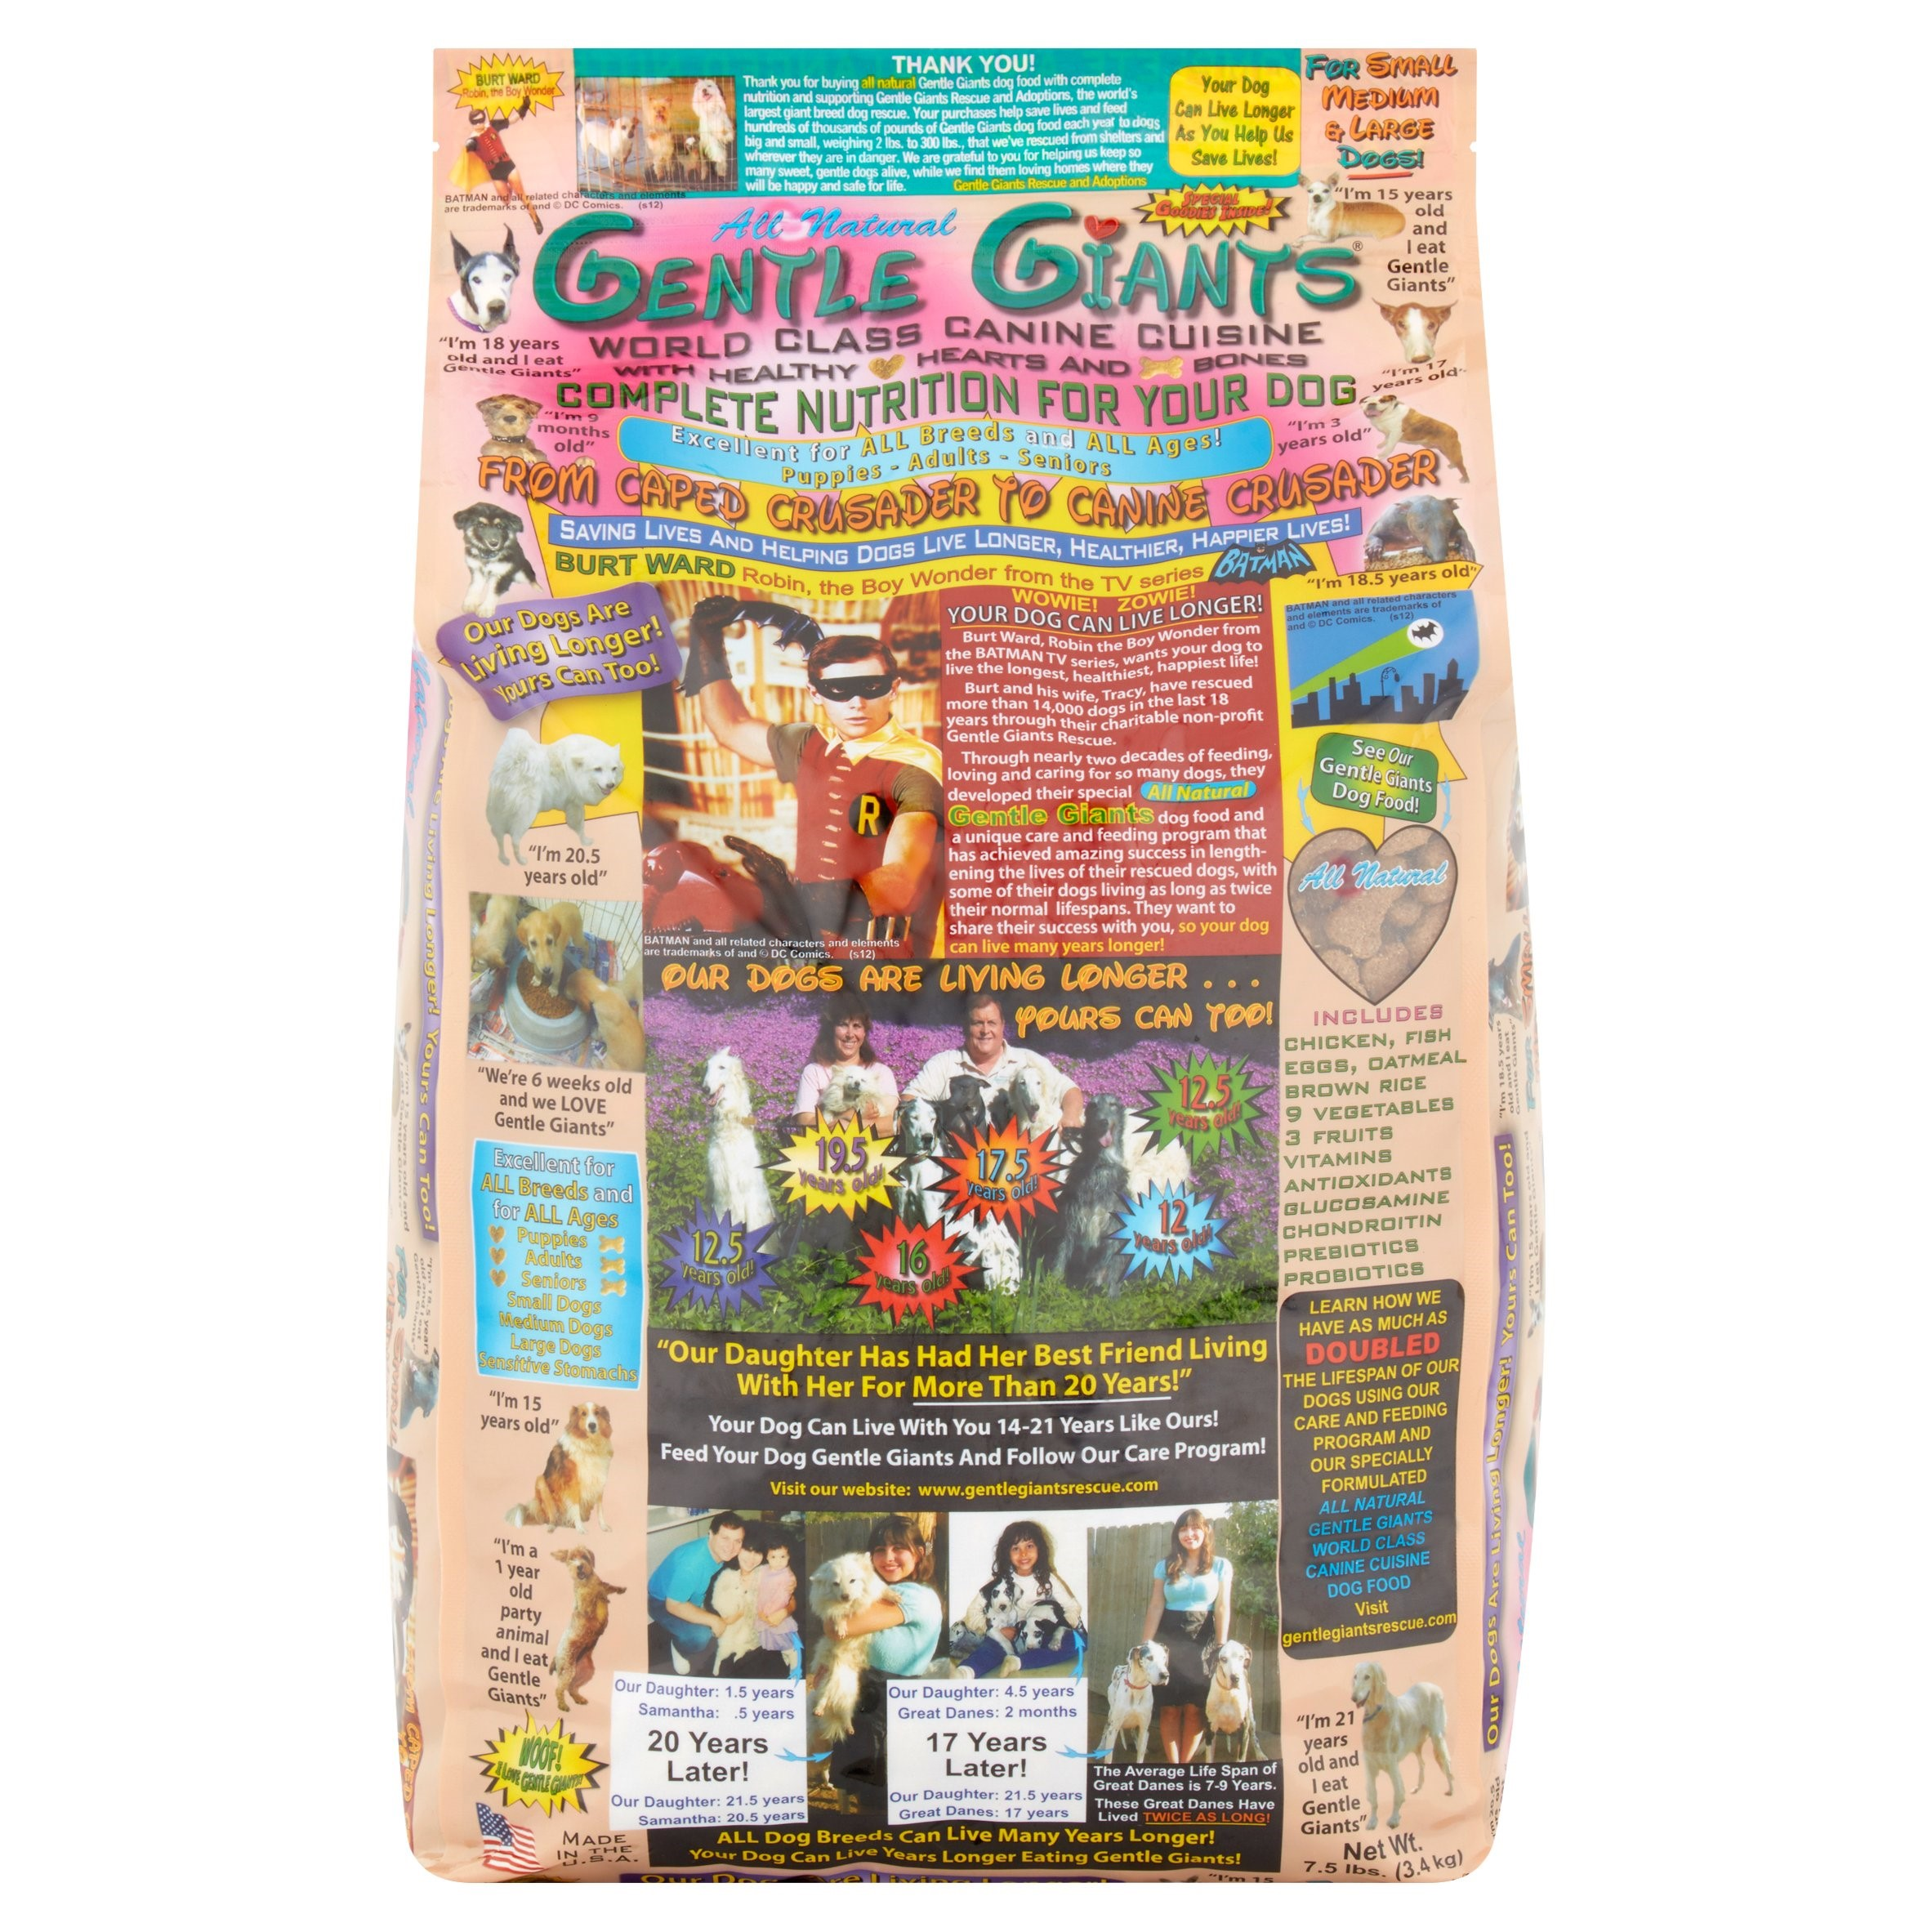 Gentle Giants Canine Nutrition Chicken Dry Dog Food, 7.5 Lb Bag